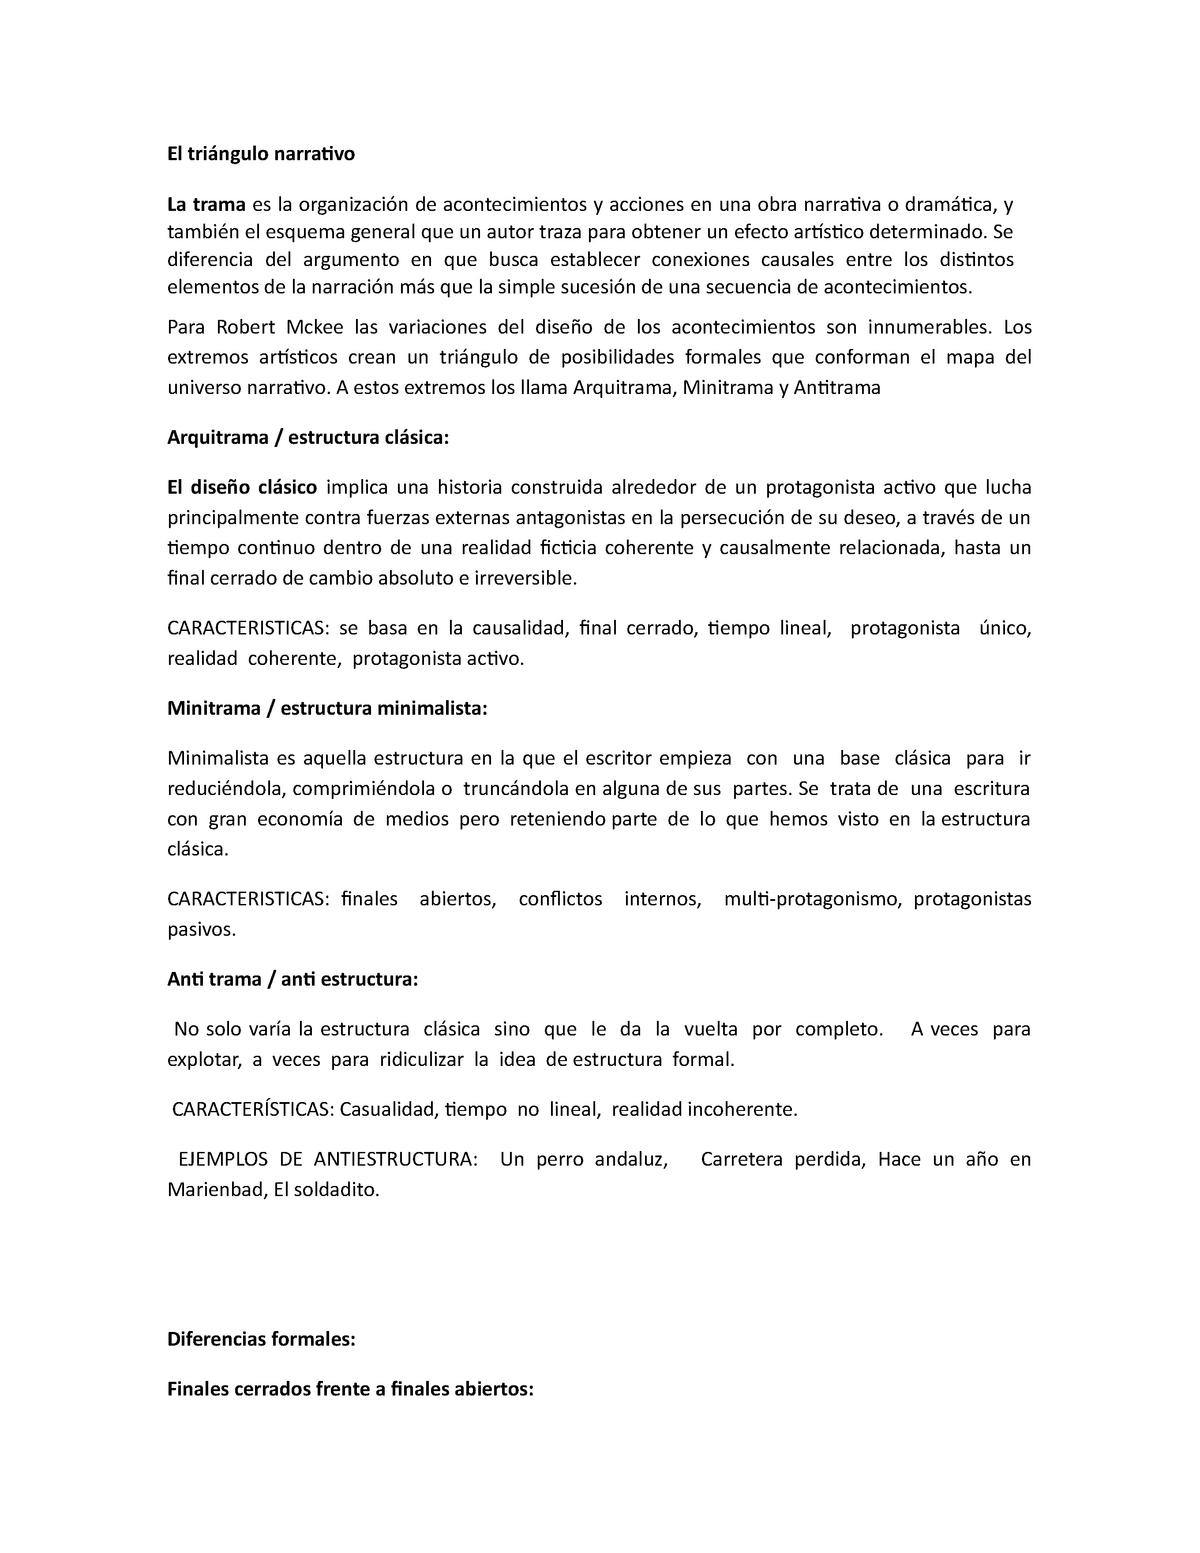 Guion Clase 1 El Triángulo Narrativo Unl Studocu